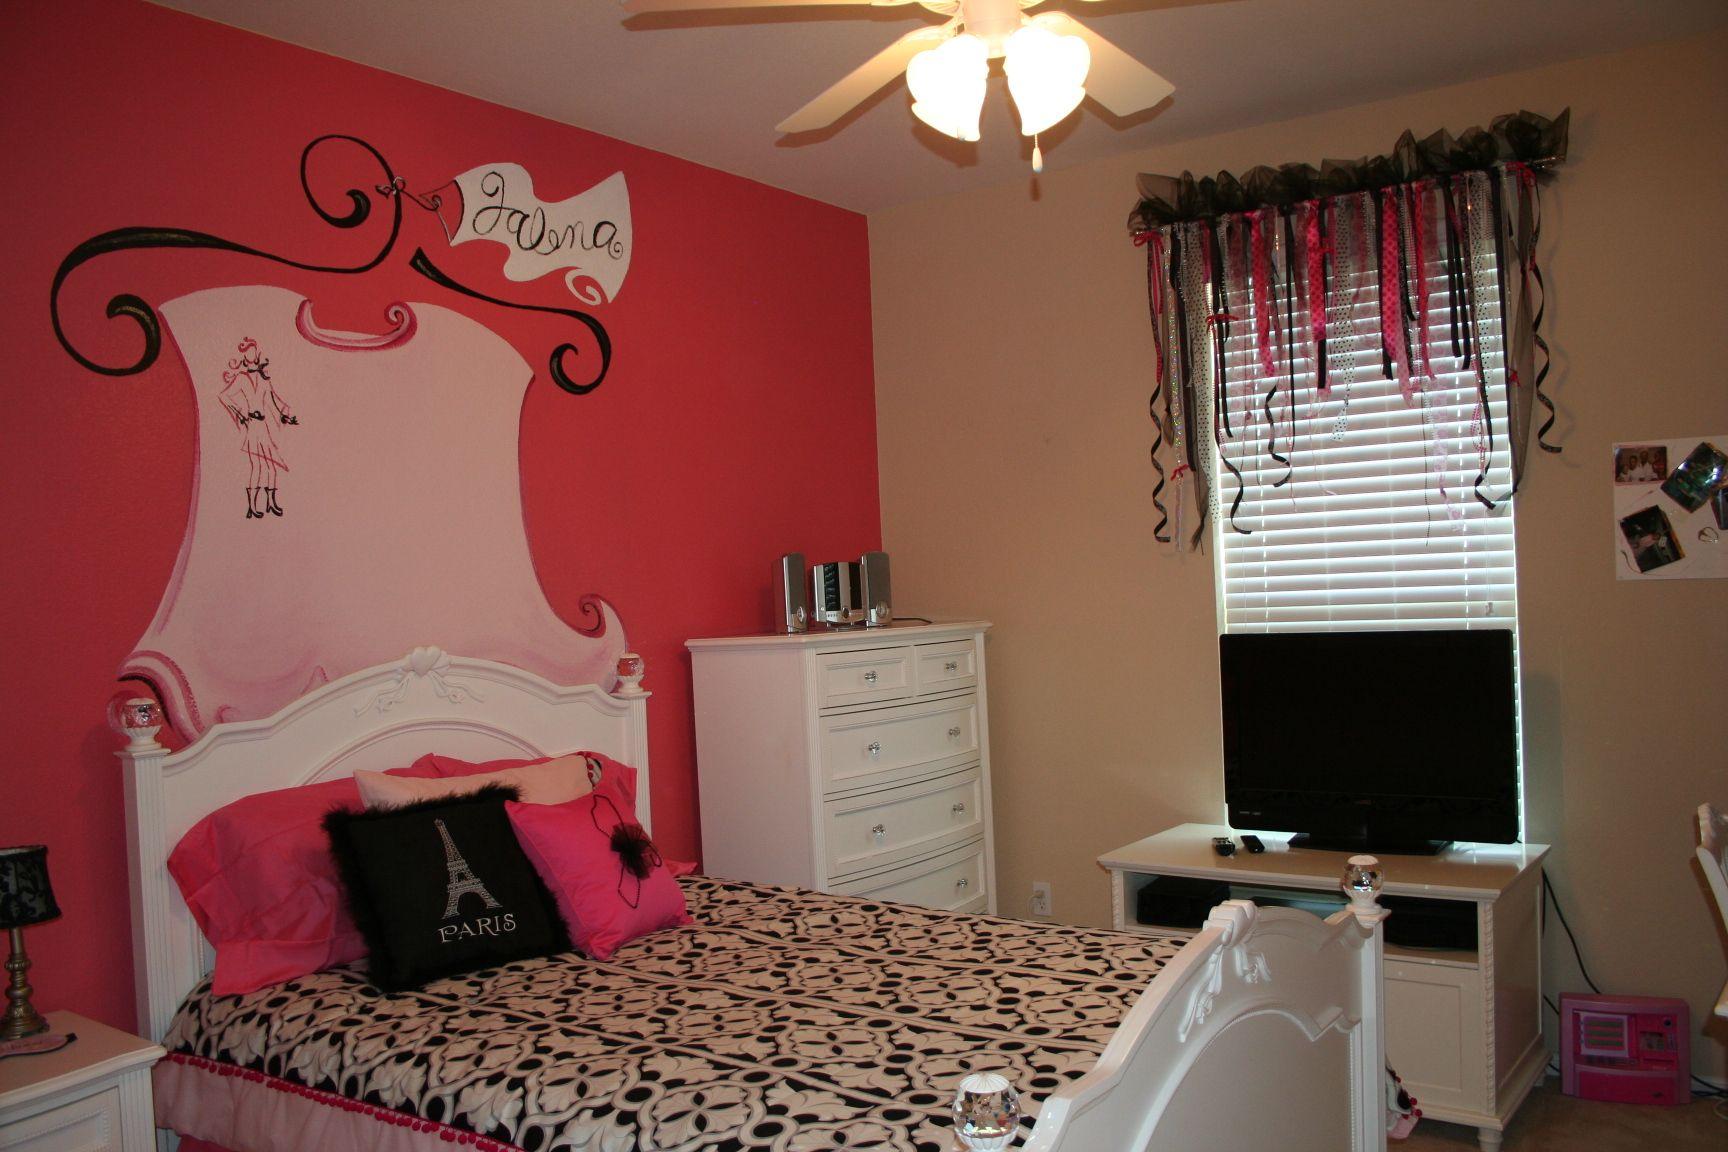 Fashionista Bedroom | Fashionista bedroom, Interior, House ...